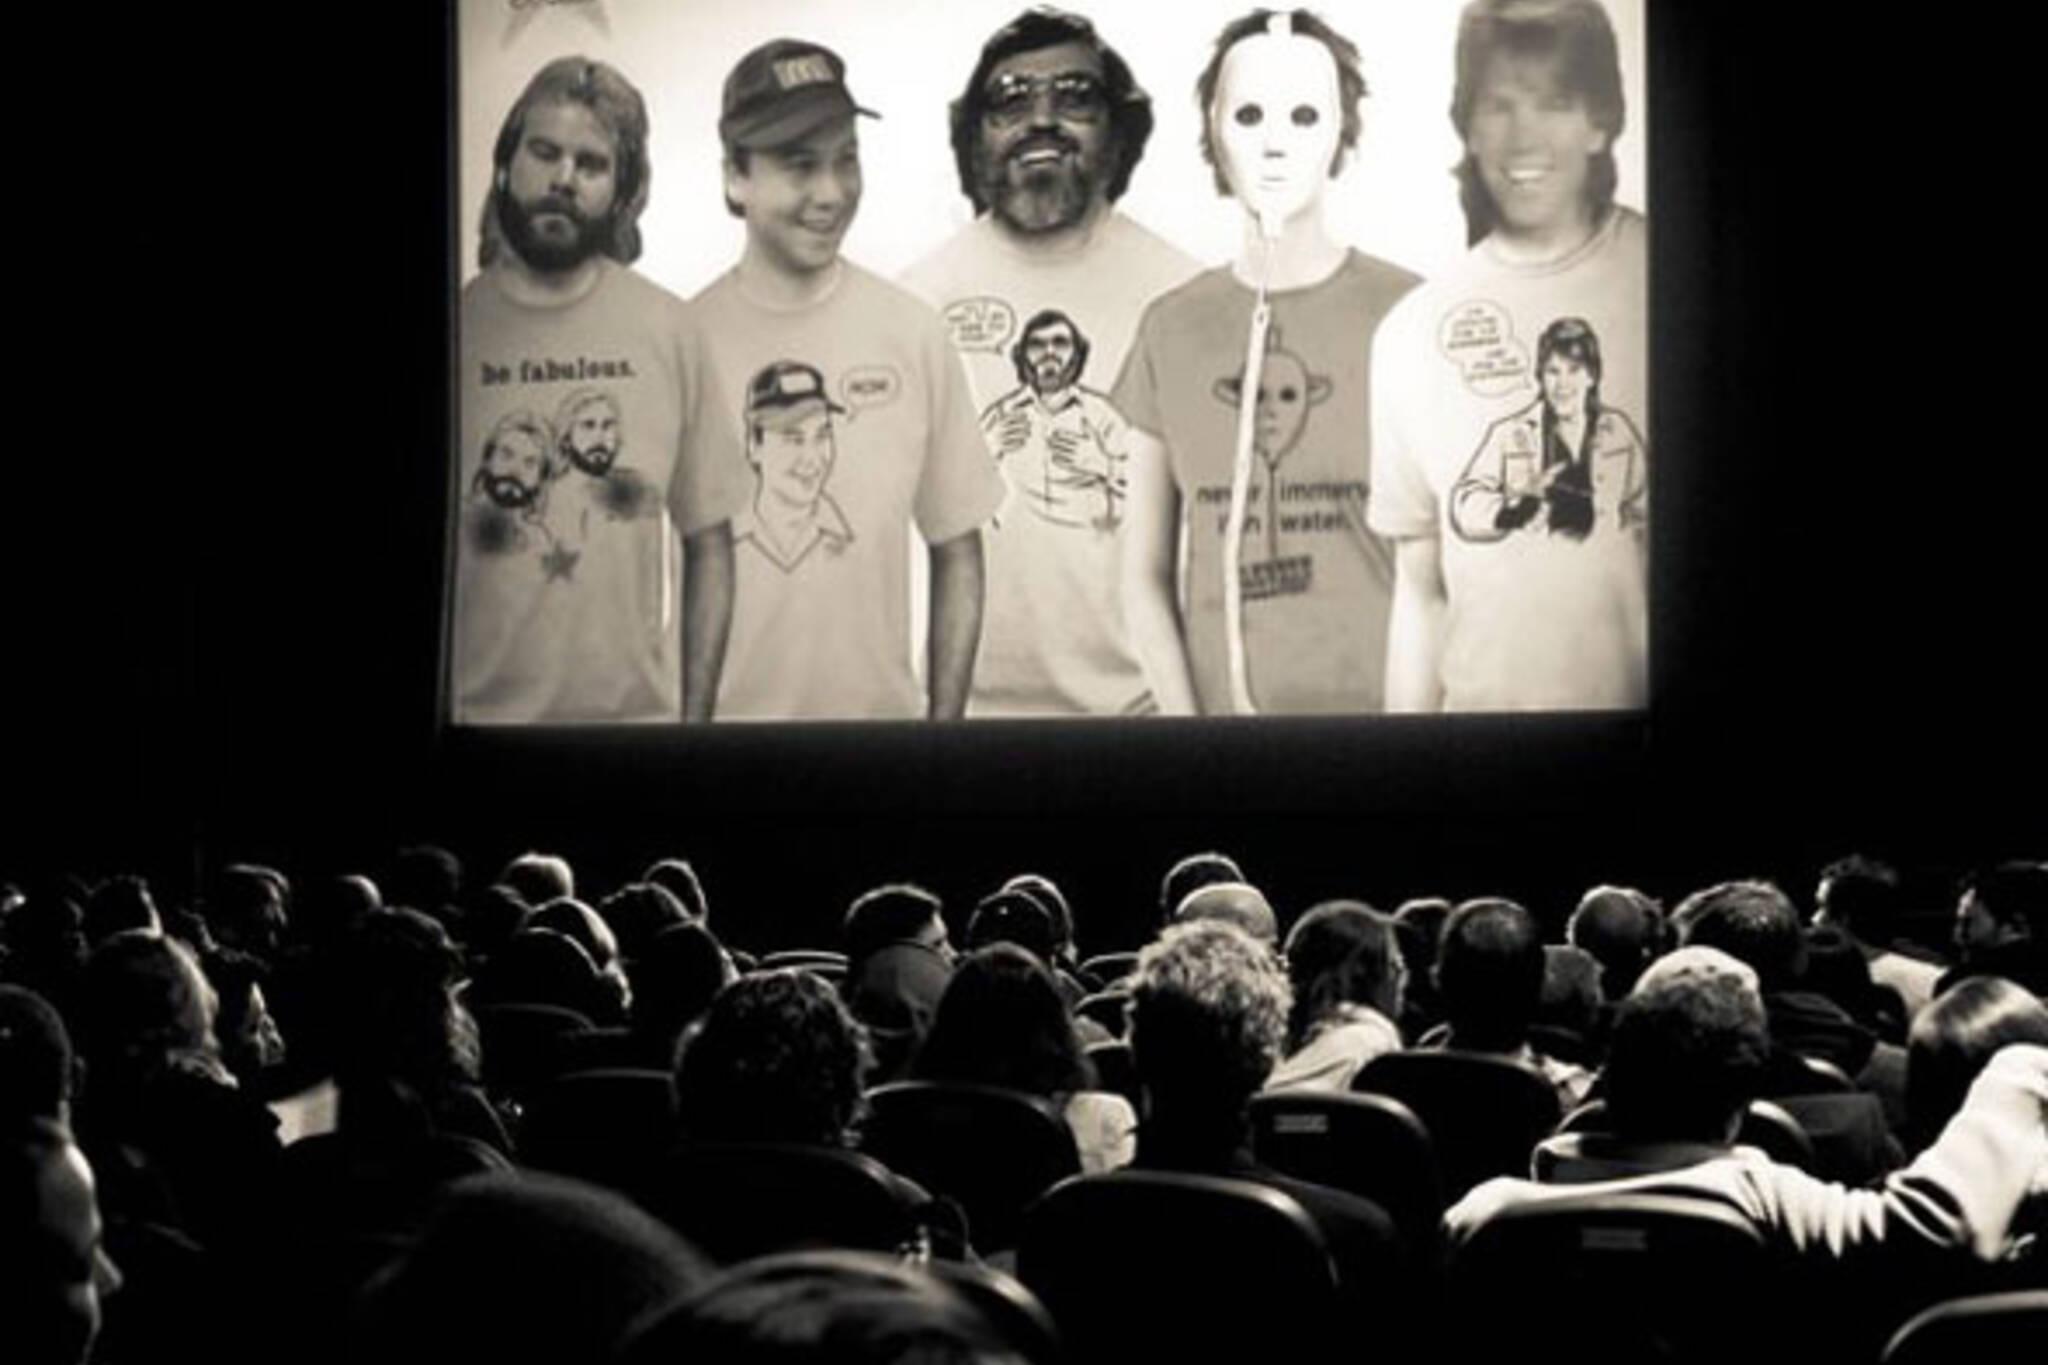 toronto found footage festival 2012